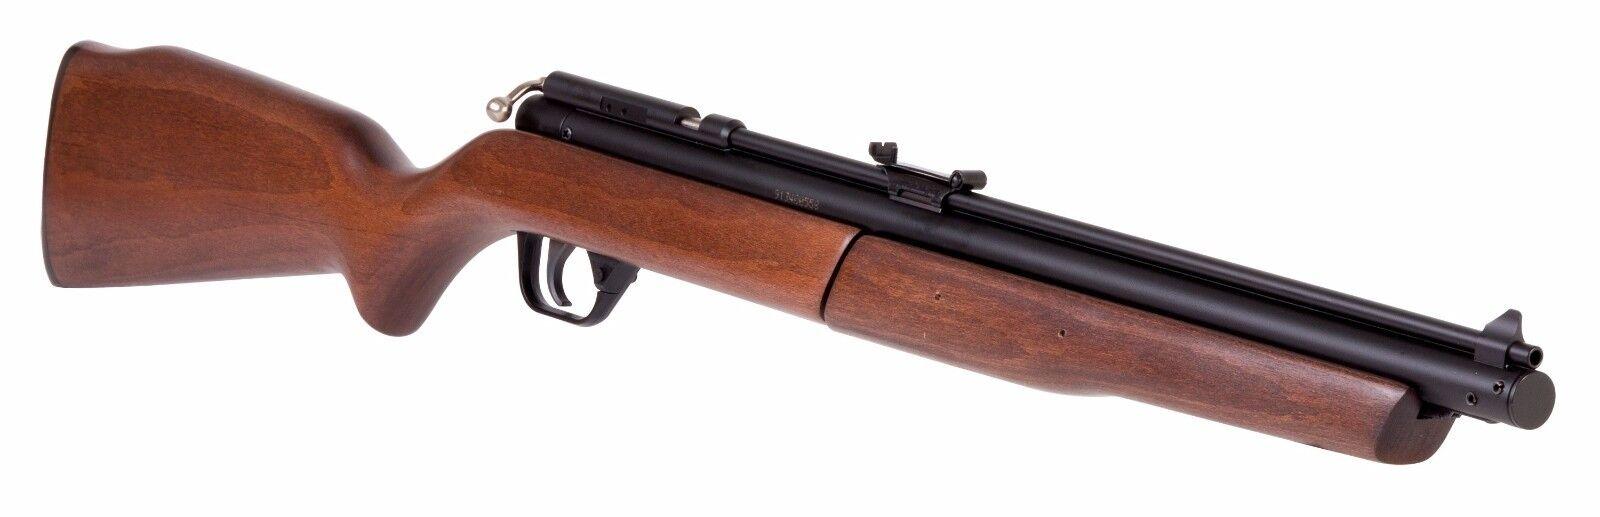 Benjamin Sheridan 392  22 Pellet Pump Bolt Action Single Shot 800FPS Air  Rifle | Shopping Bin - Search eBay faster